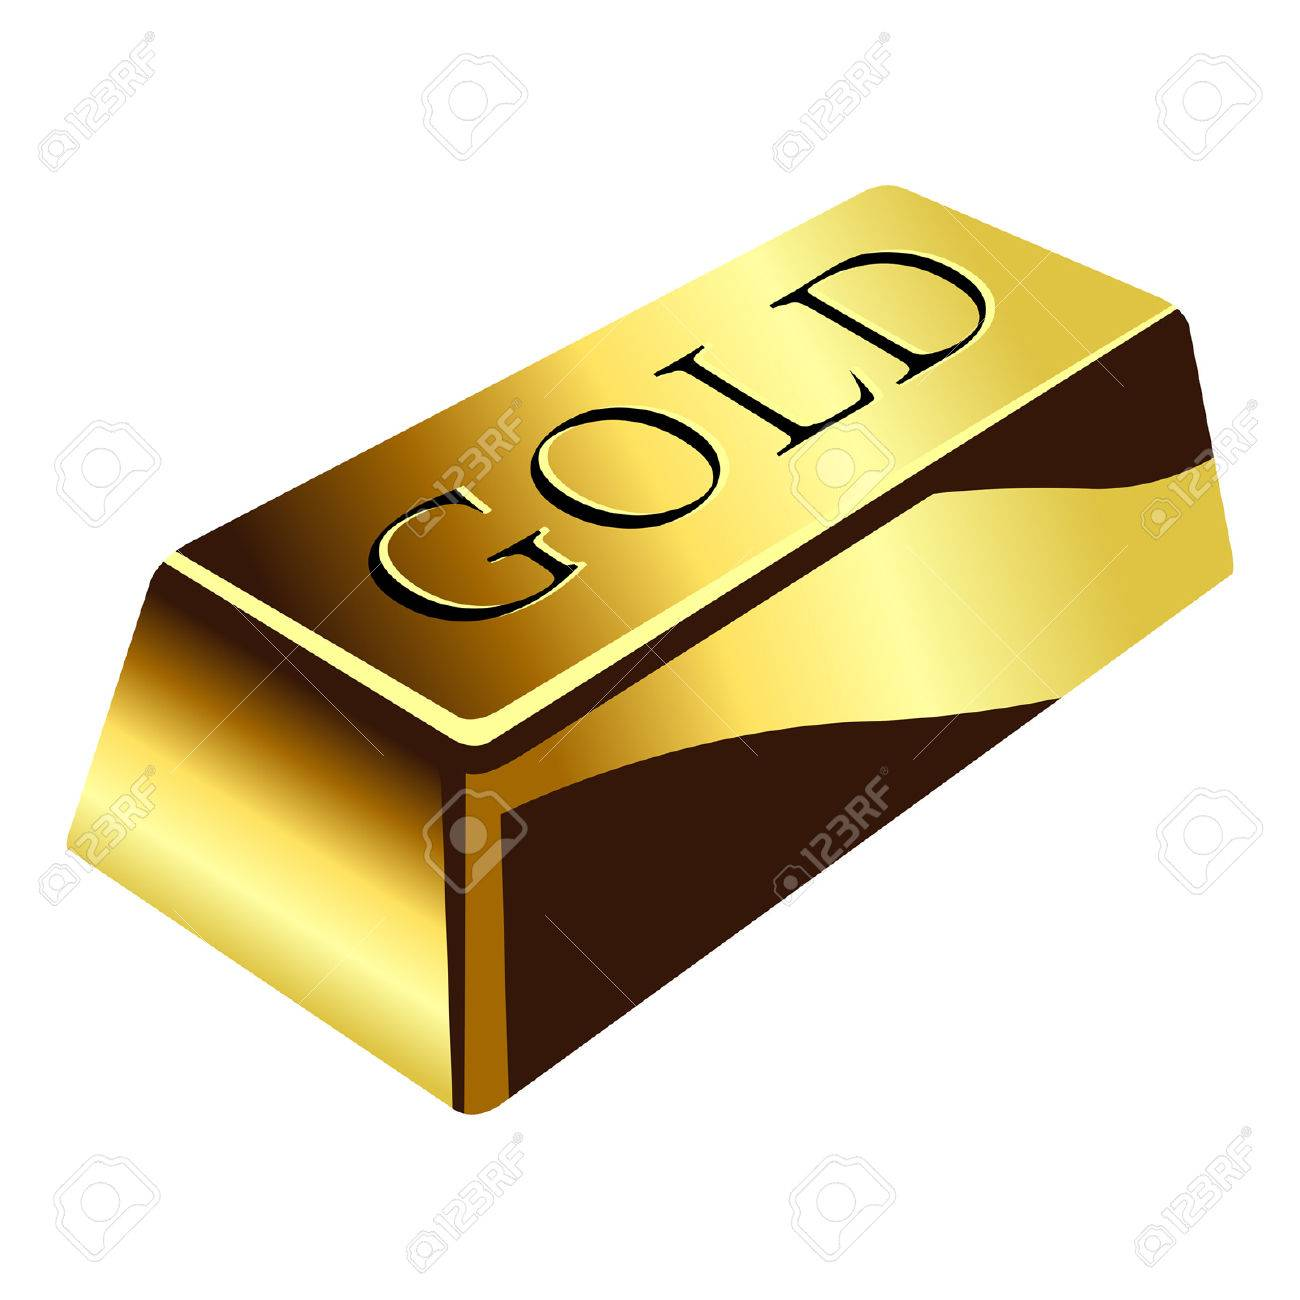 Gold Bar Clipart & Free Gold Bar Clipart.png Transparent.